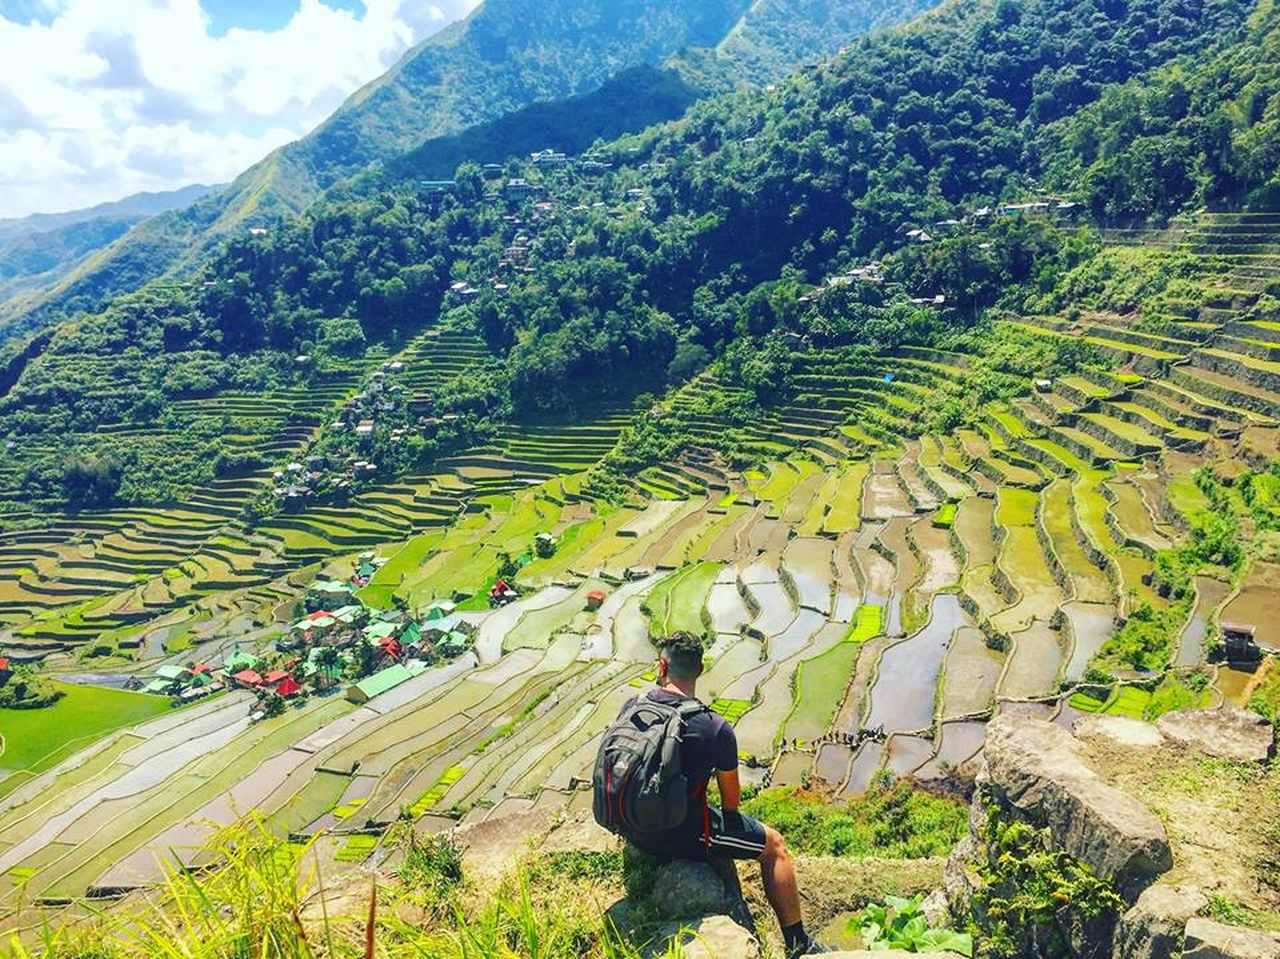 Batad Rice Terraces 2018